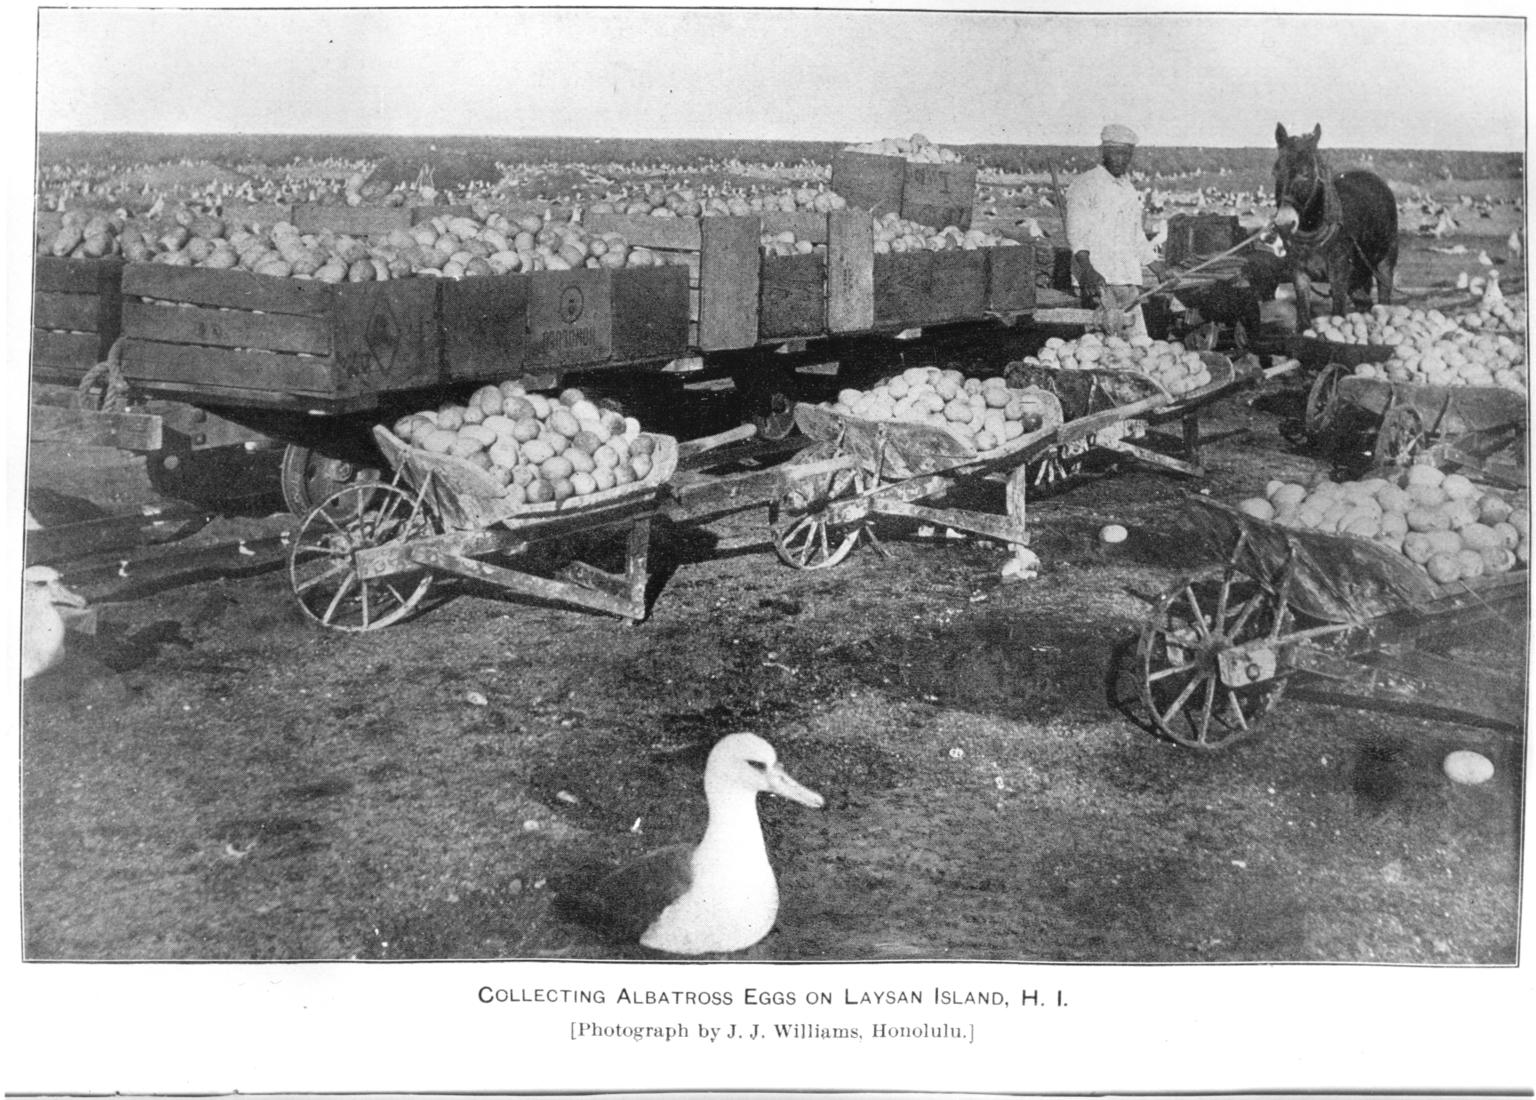 Collecting albatross eggs on Laysan Island.